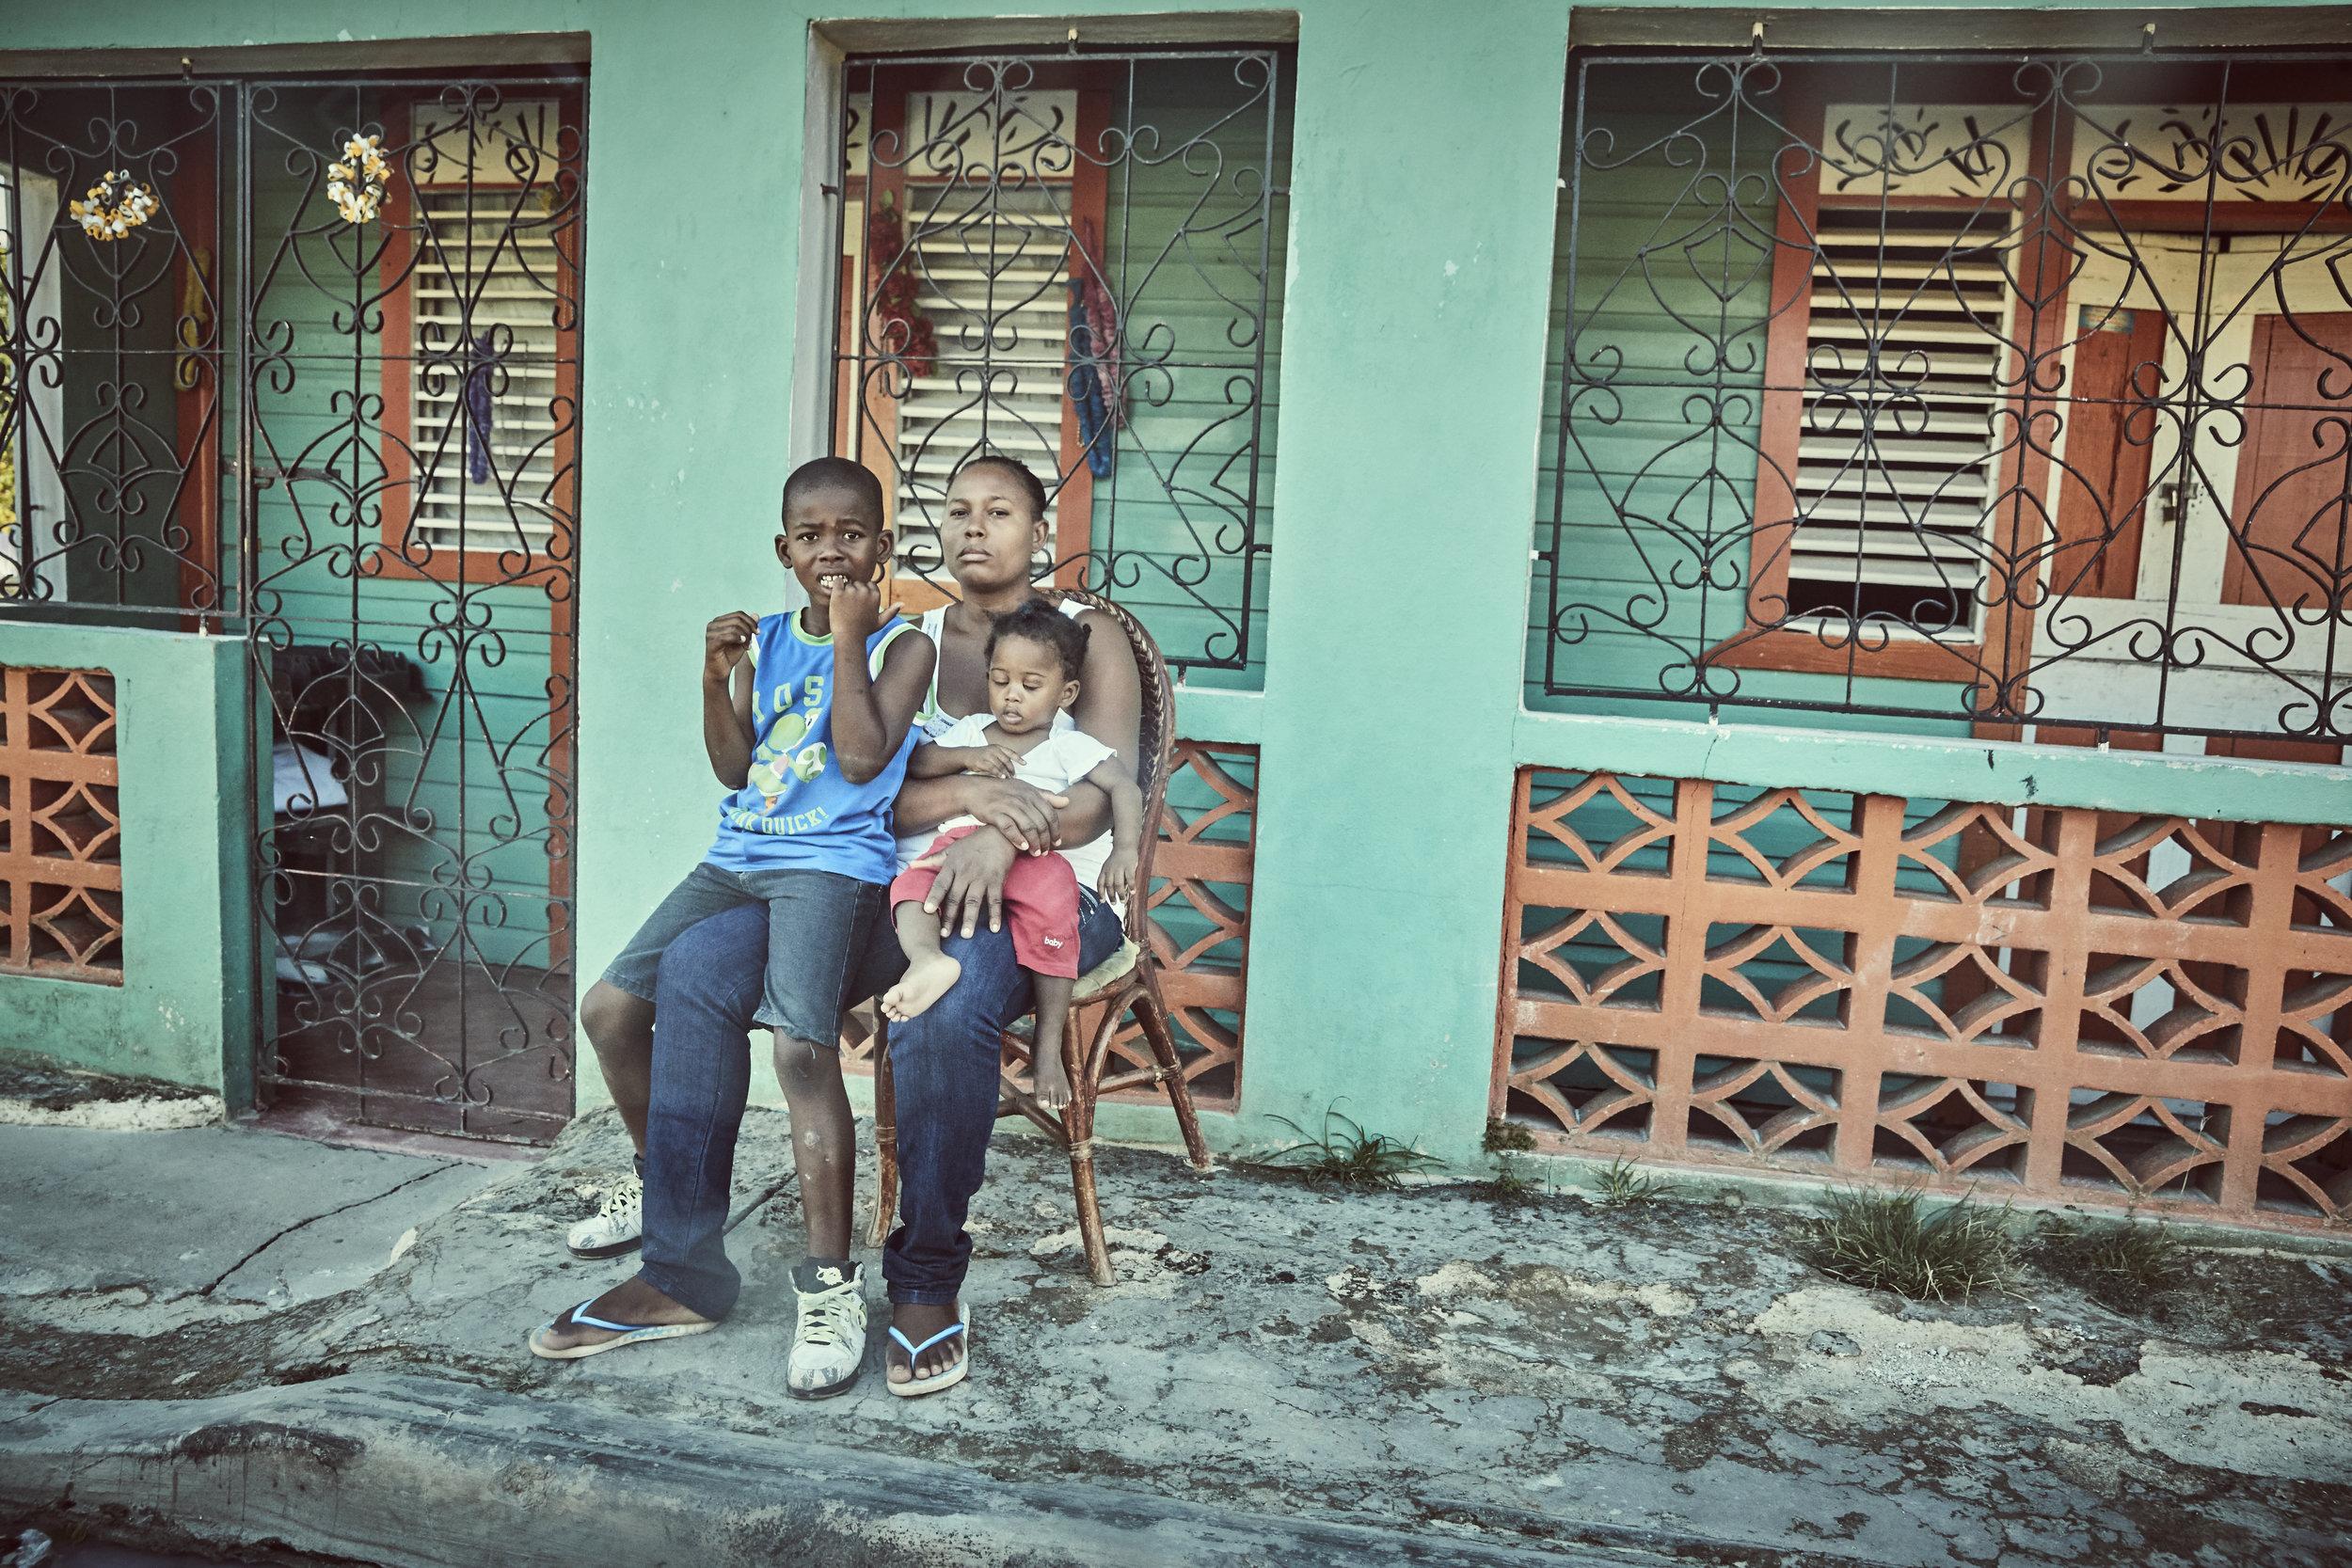 DOMINICAN_REP_17_12303.jpg